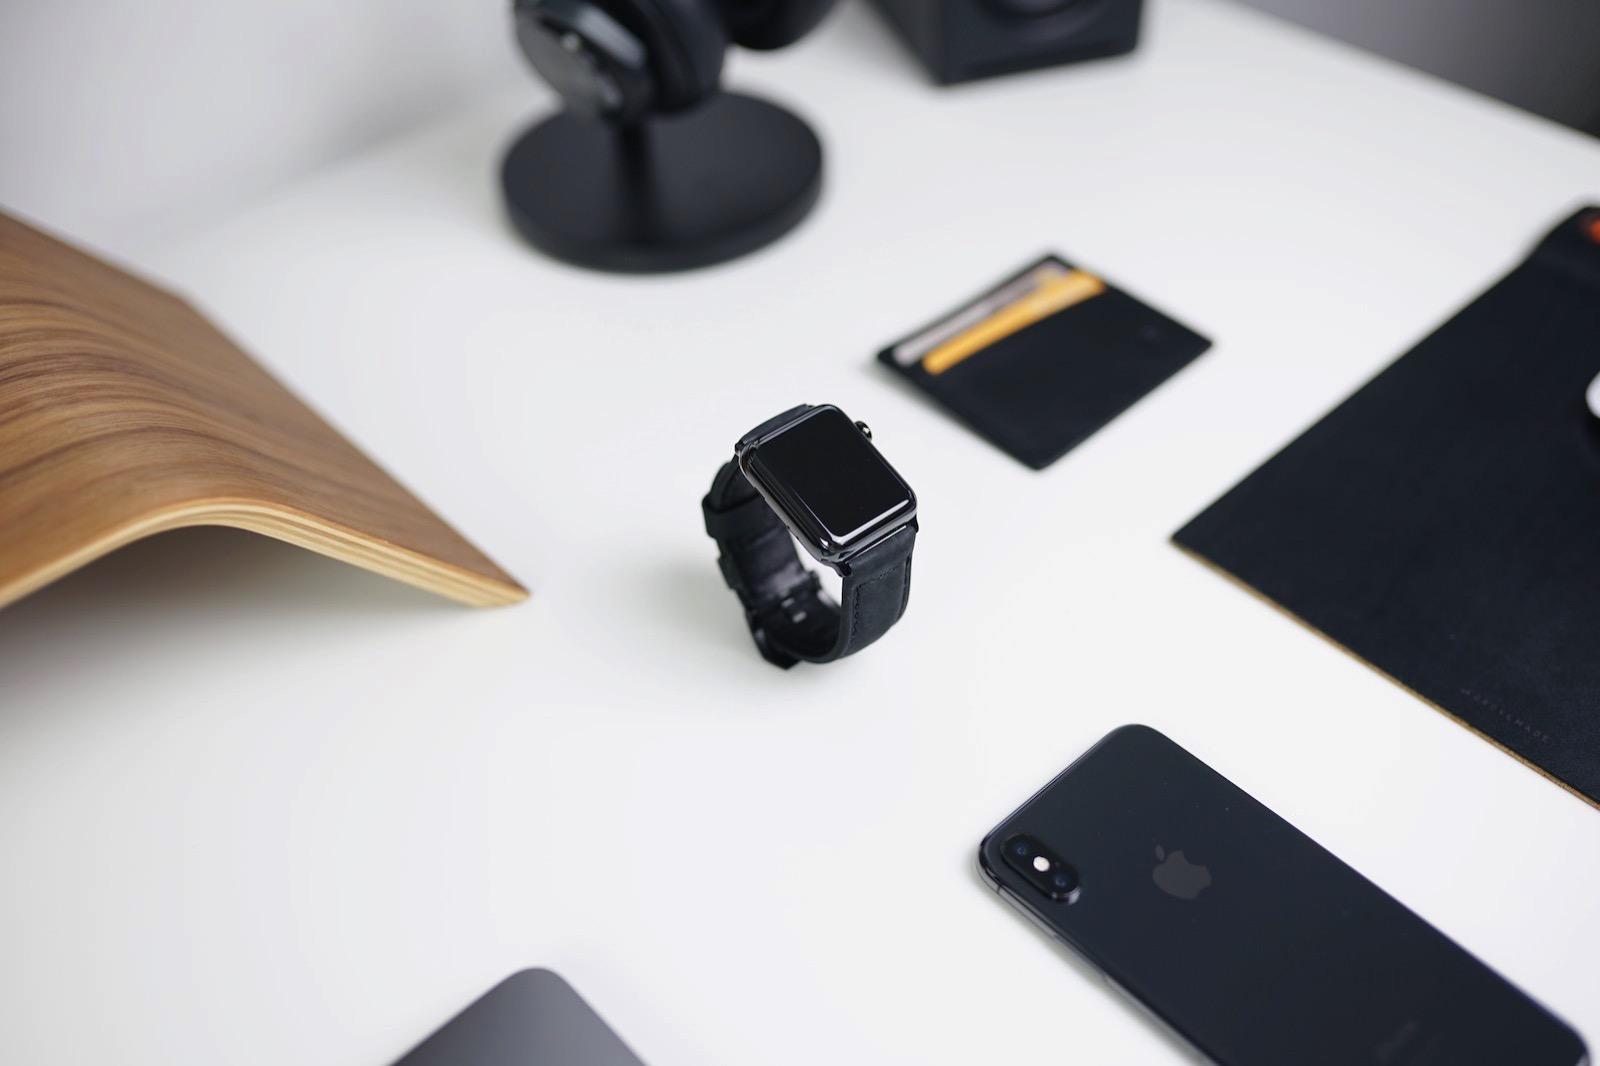 nikolay-tarashchenko-551718-unsplash-apple-watch.jpg